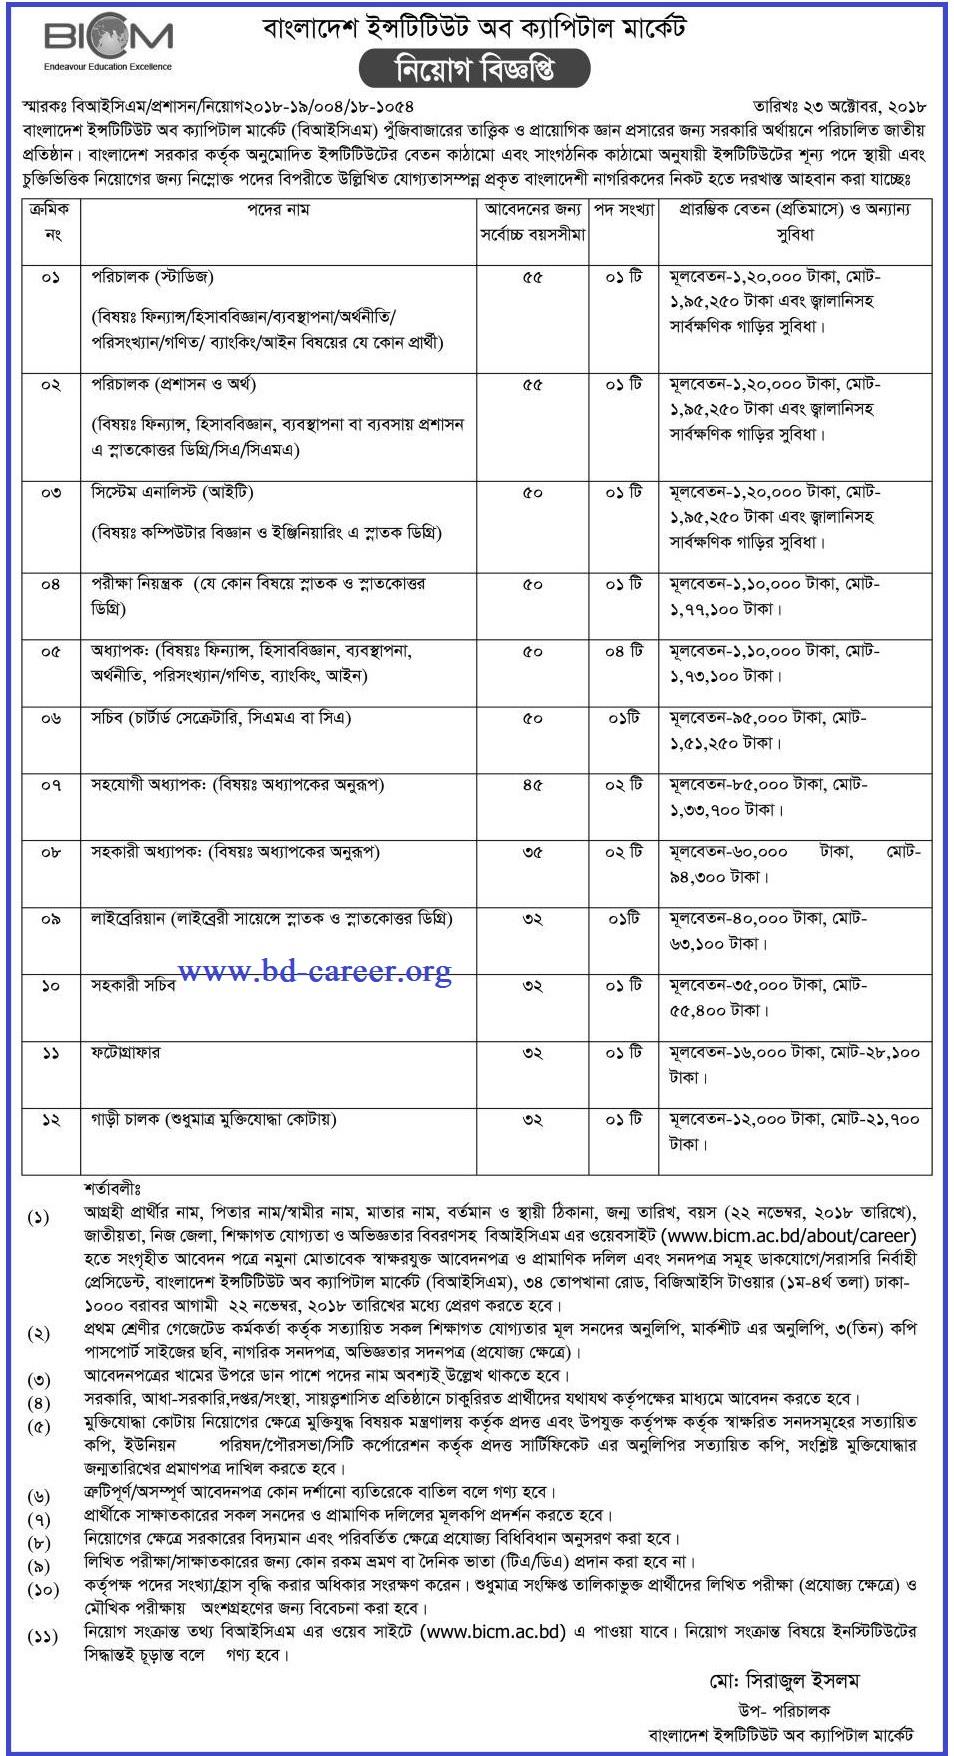 BICM Job Circular Apply some new vacancy post.